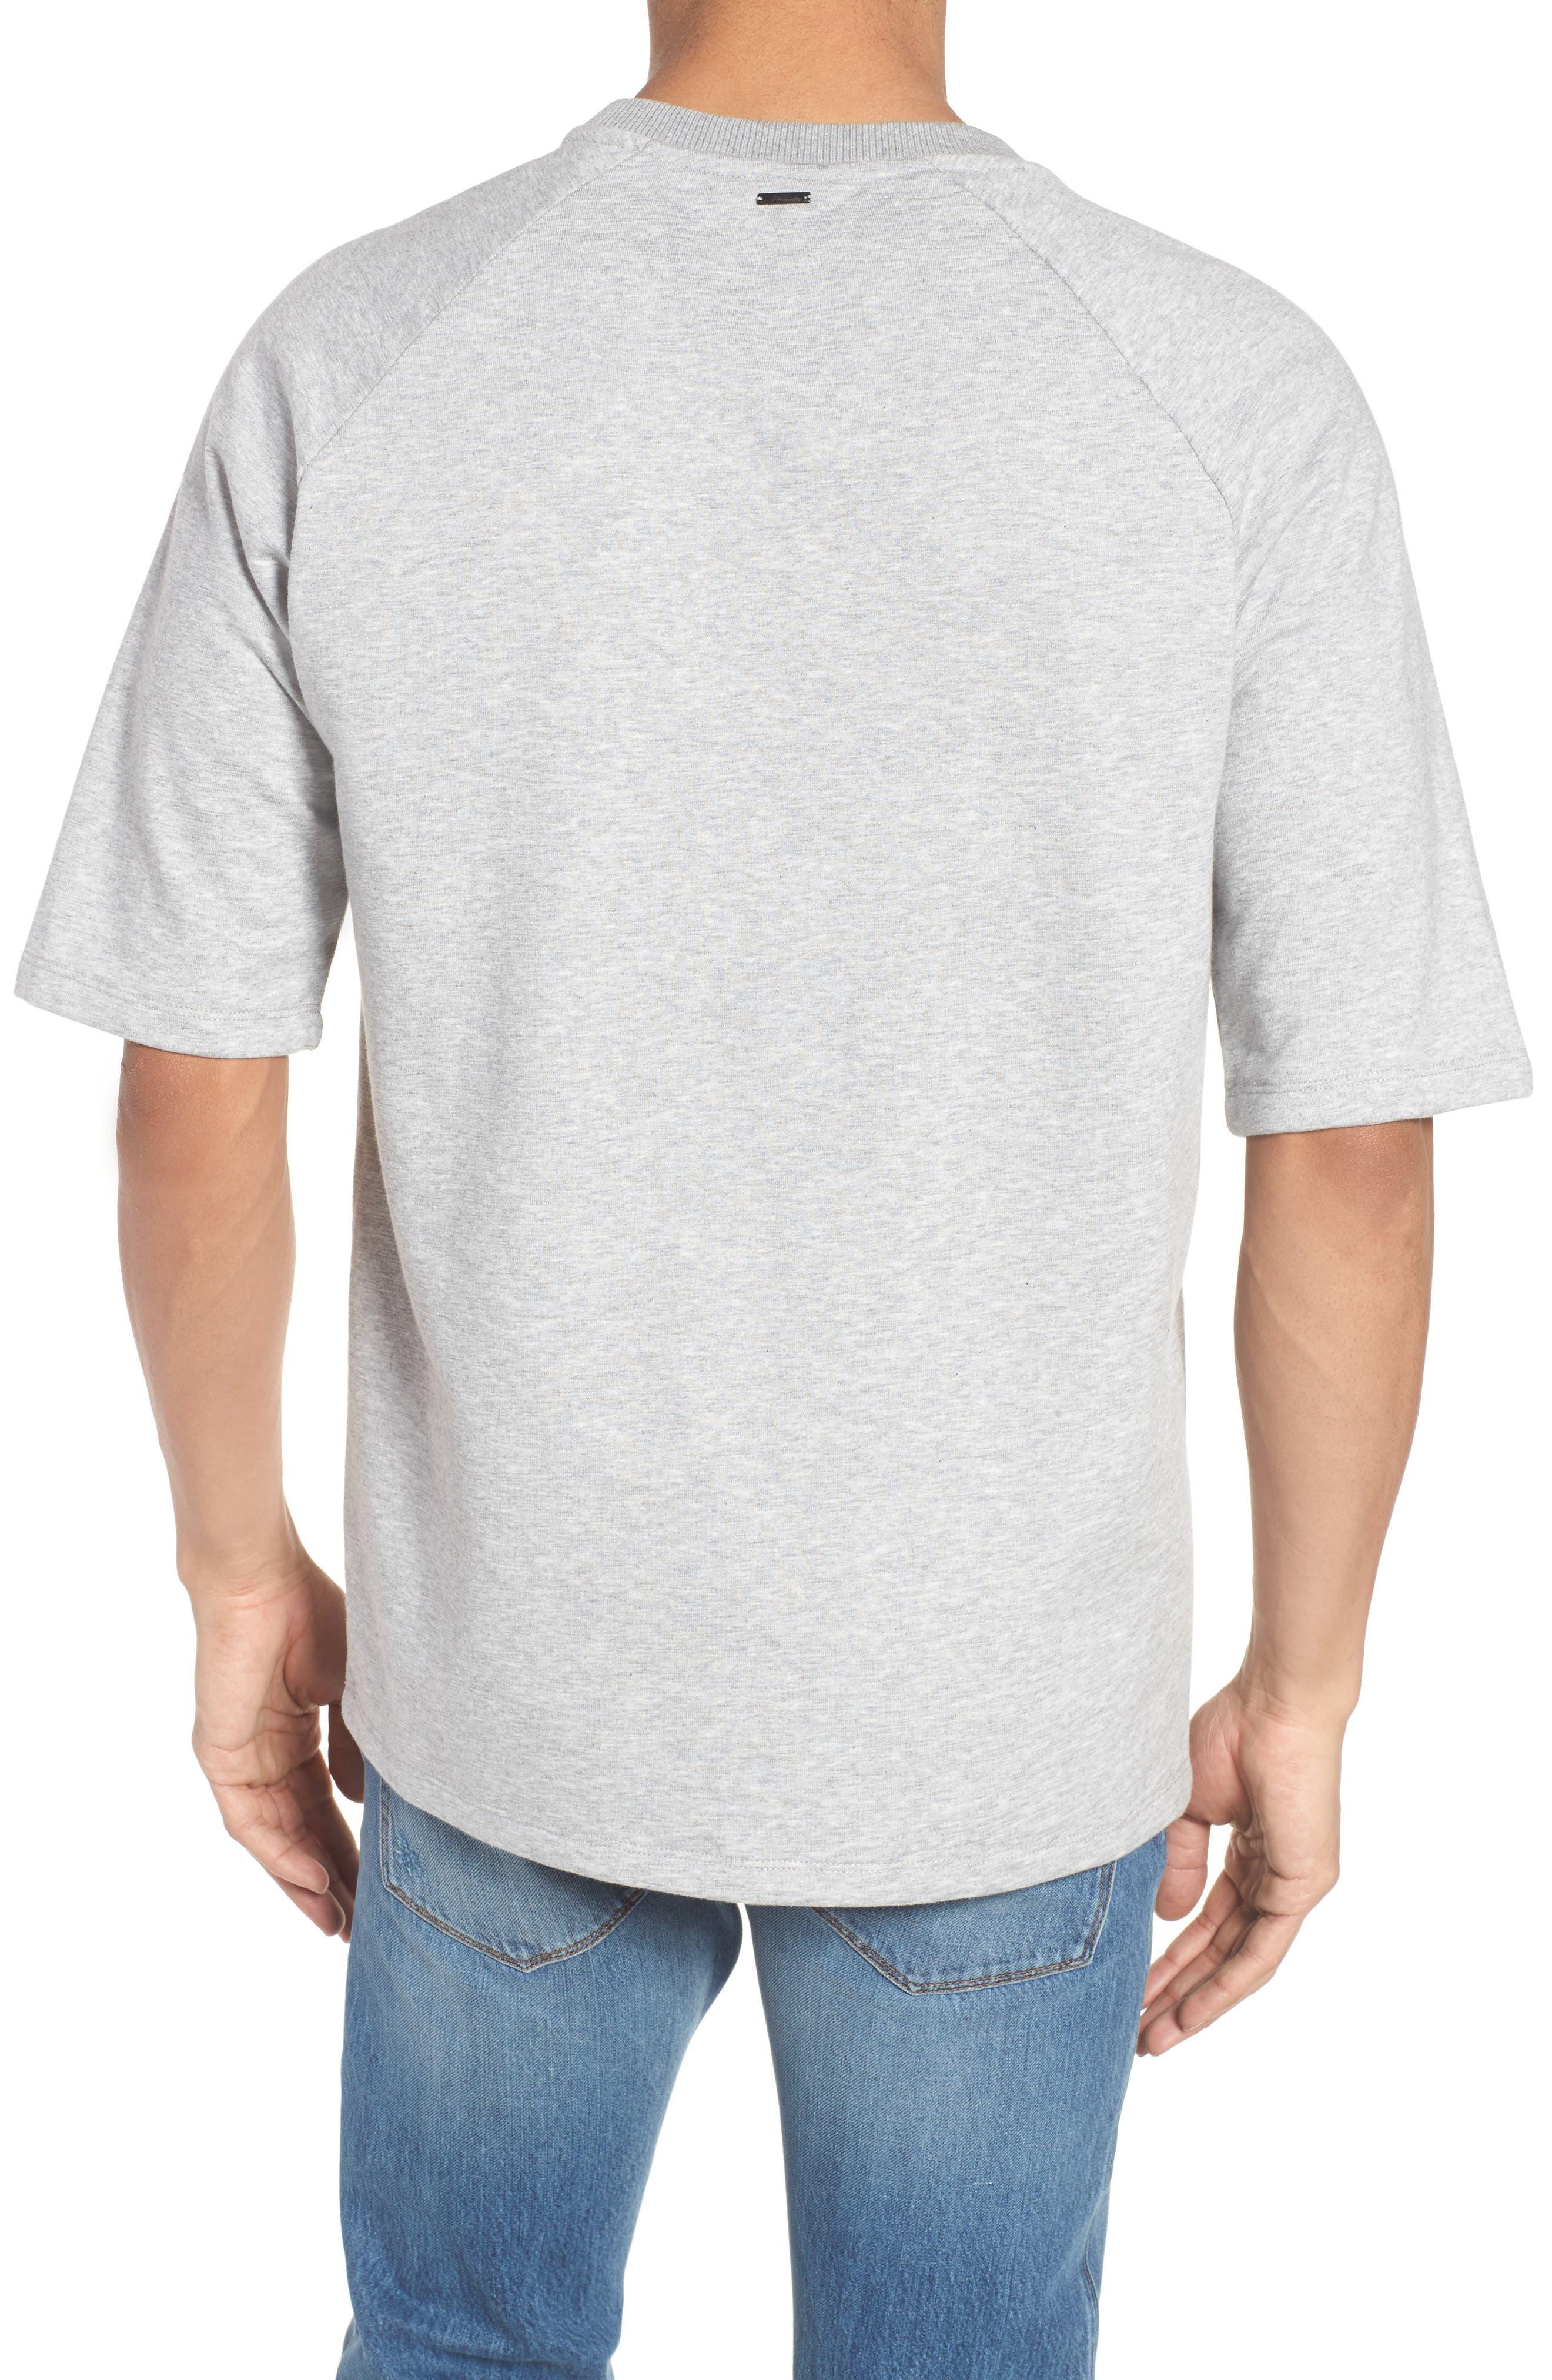 Deast Doodle Sweatshirt,                             Alternate thumbnail 2, color,                             Grey